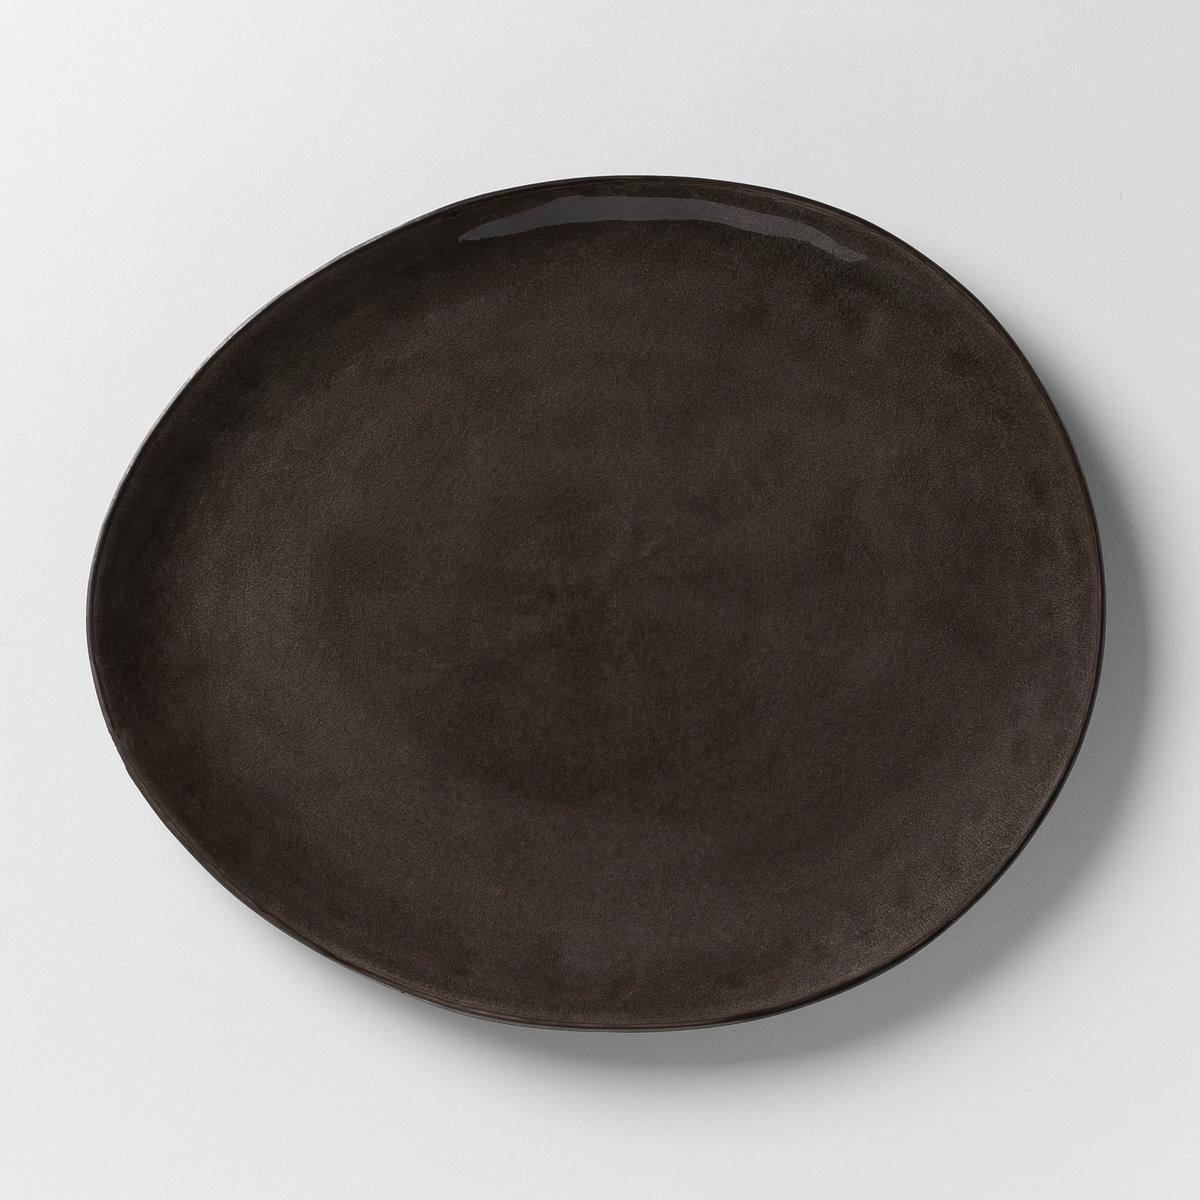 Комплект из 2 мелких тарелок Pure, дизайн П. Нессенса, Serax от La Redoute